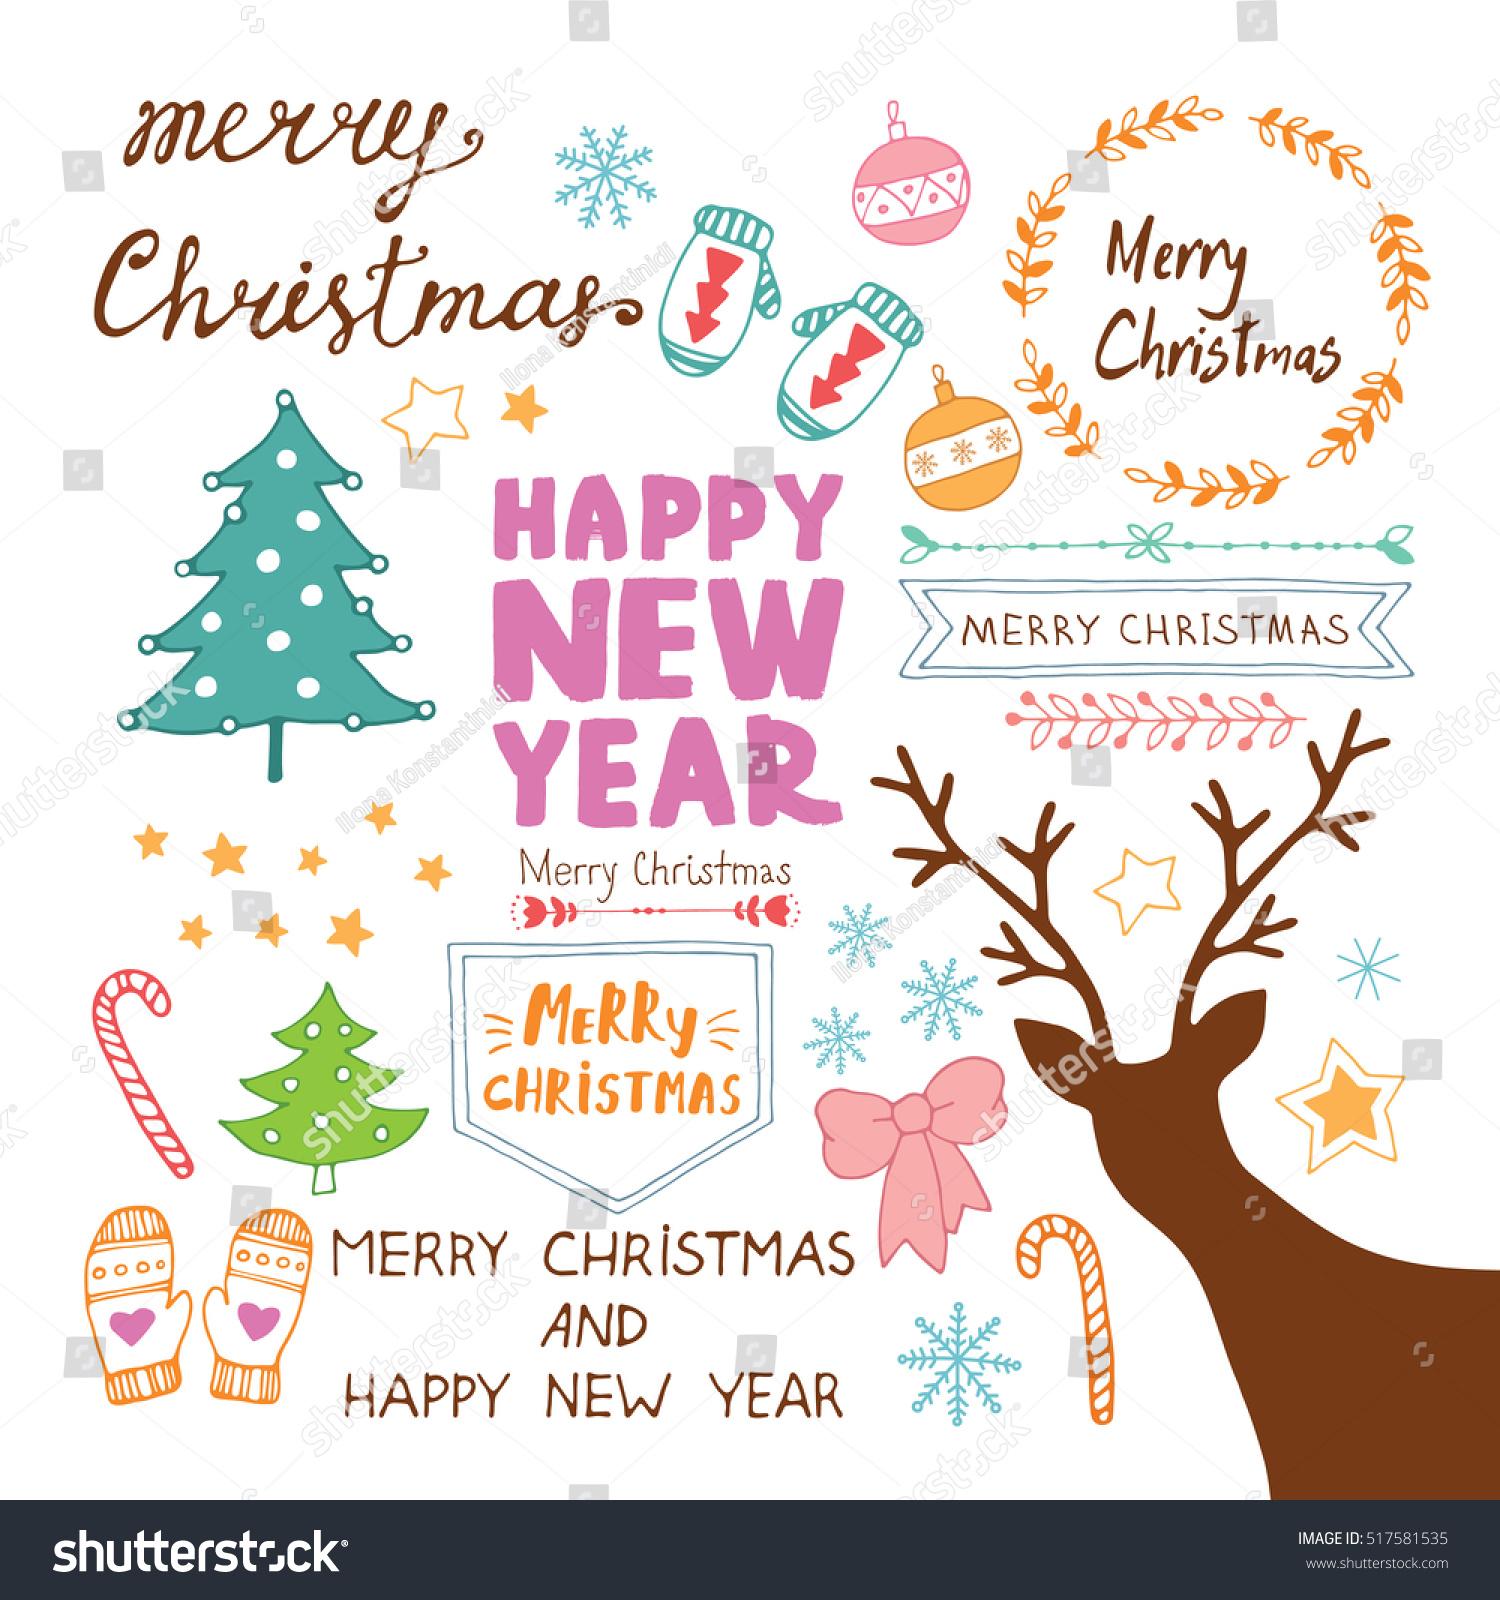 Merry Christmas Happy New Year Doodles Stock-Vektorgrafik ...